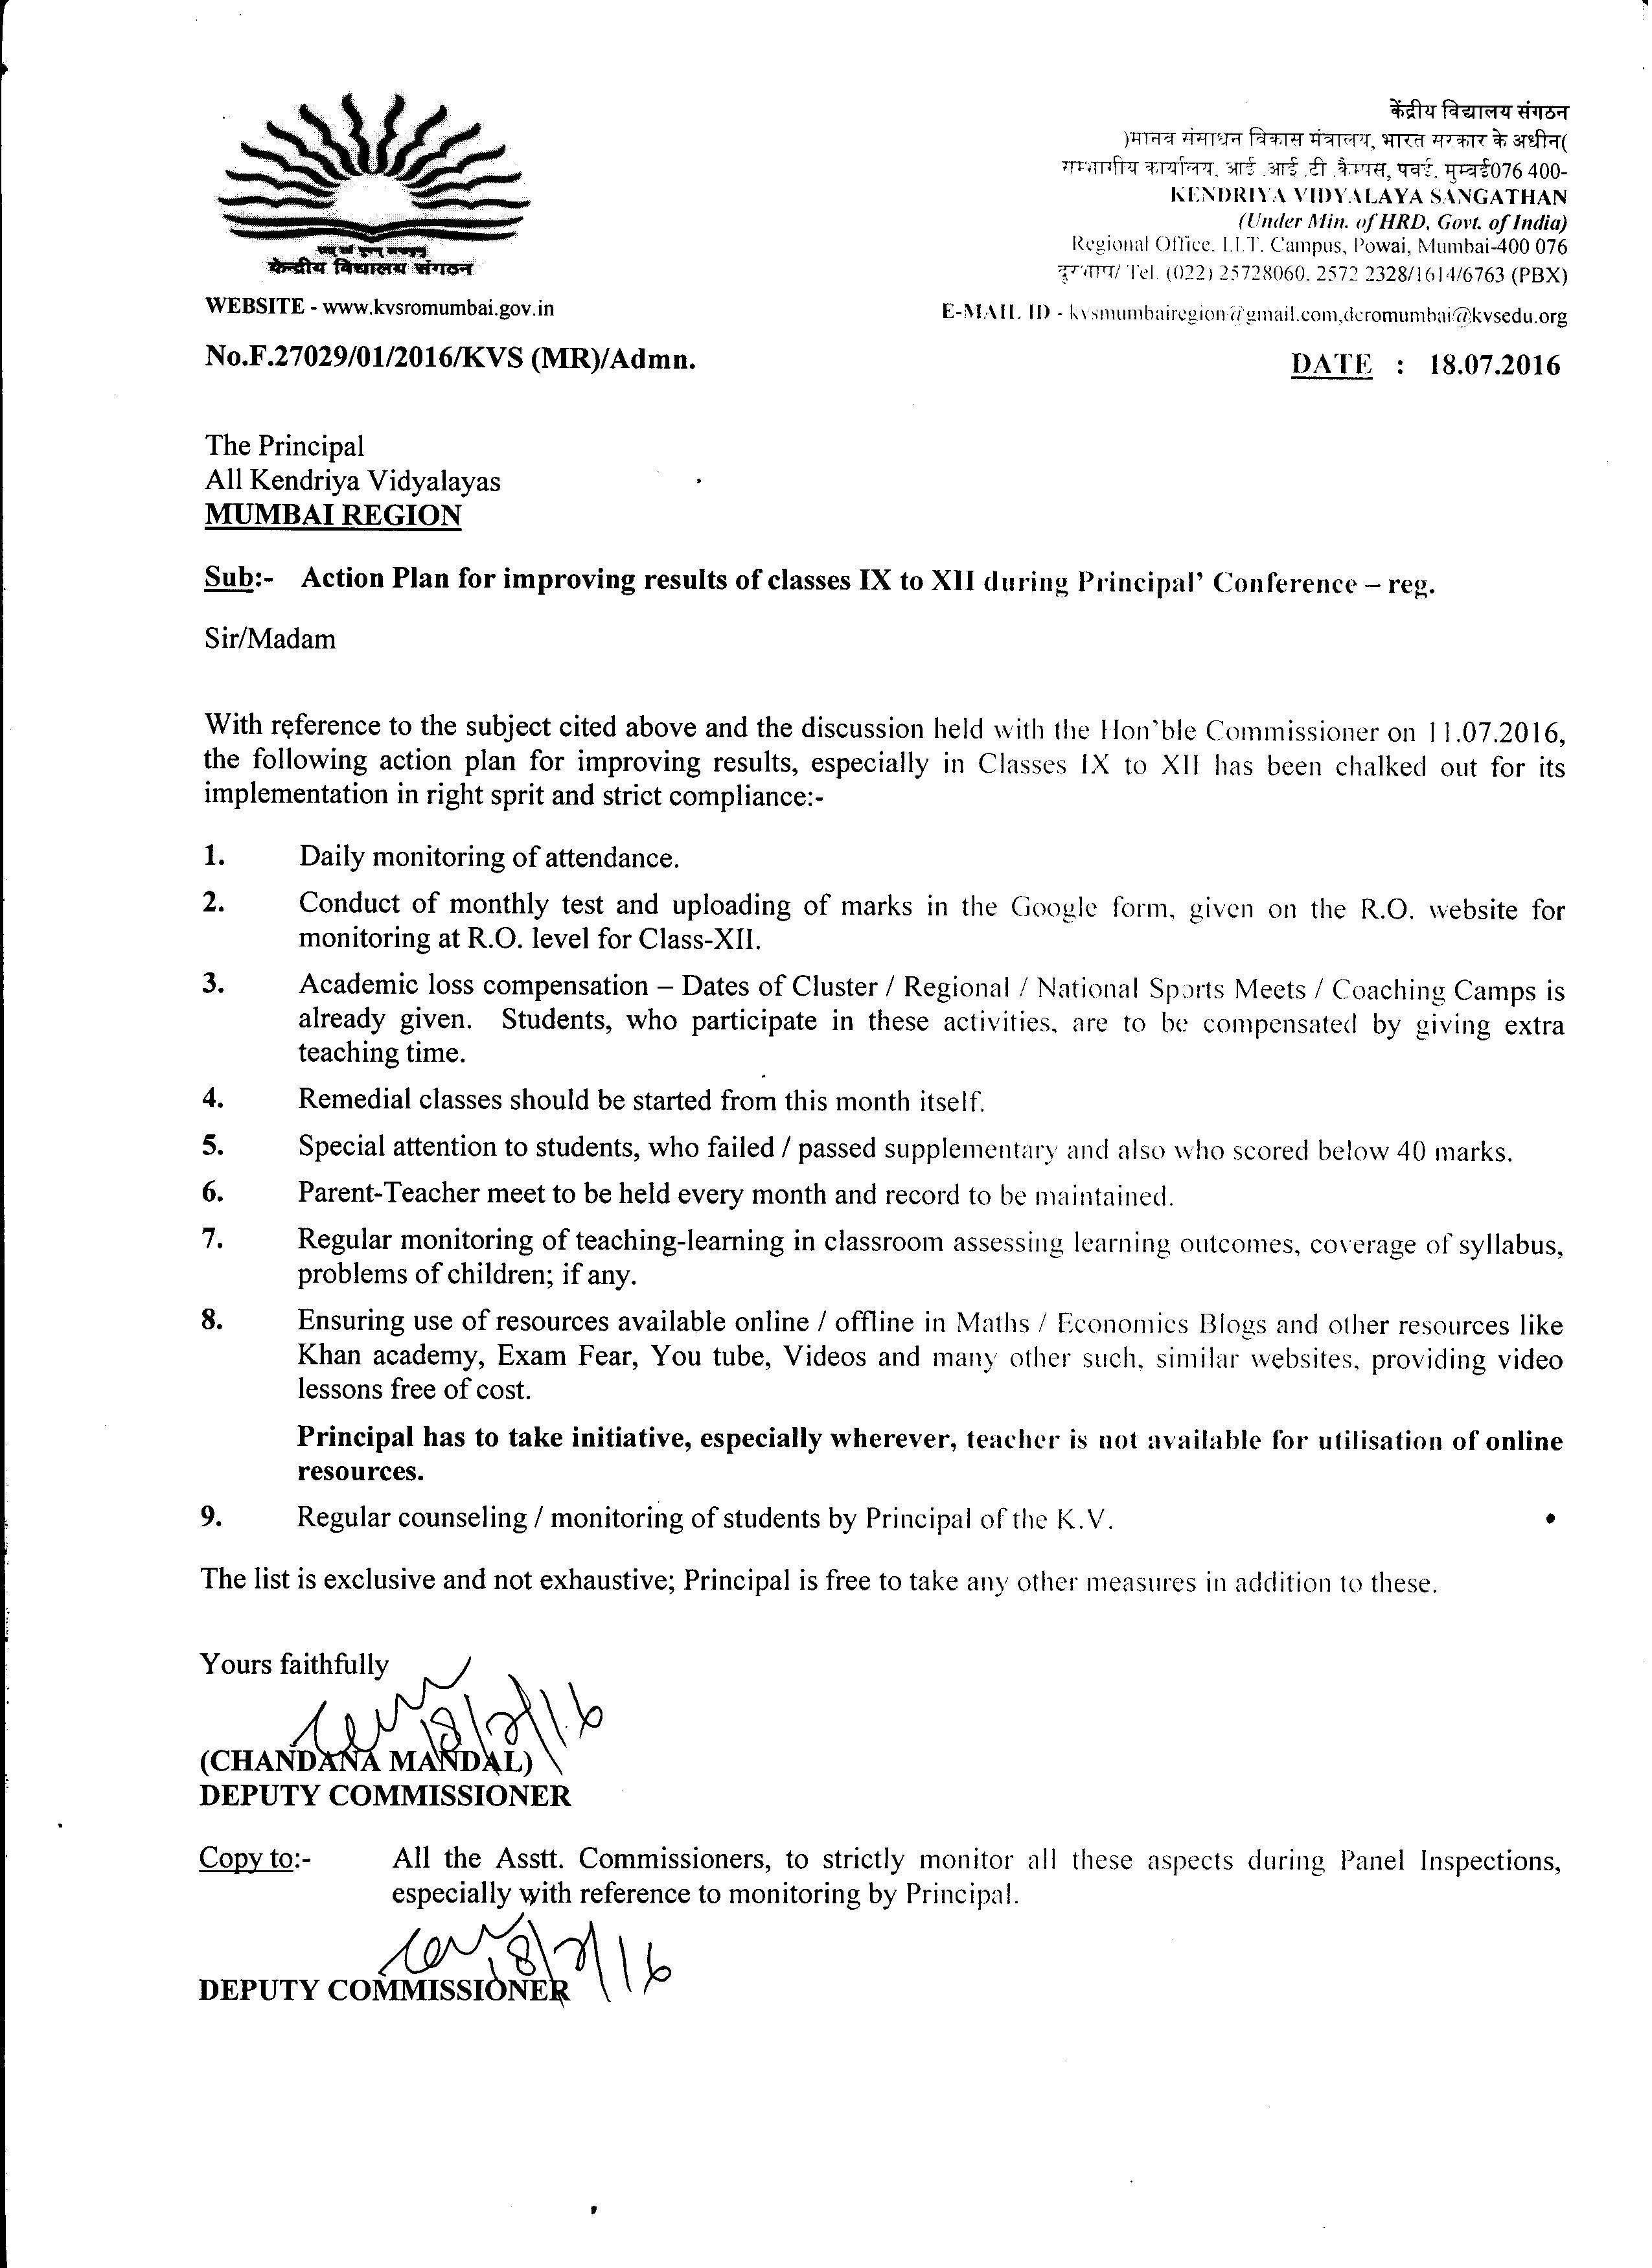 From Deputy Commissioner Office Kvs Mumbai